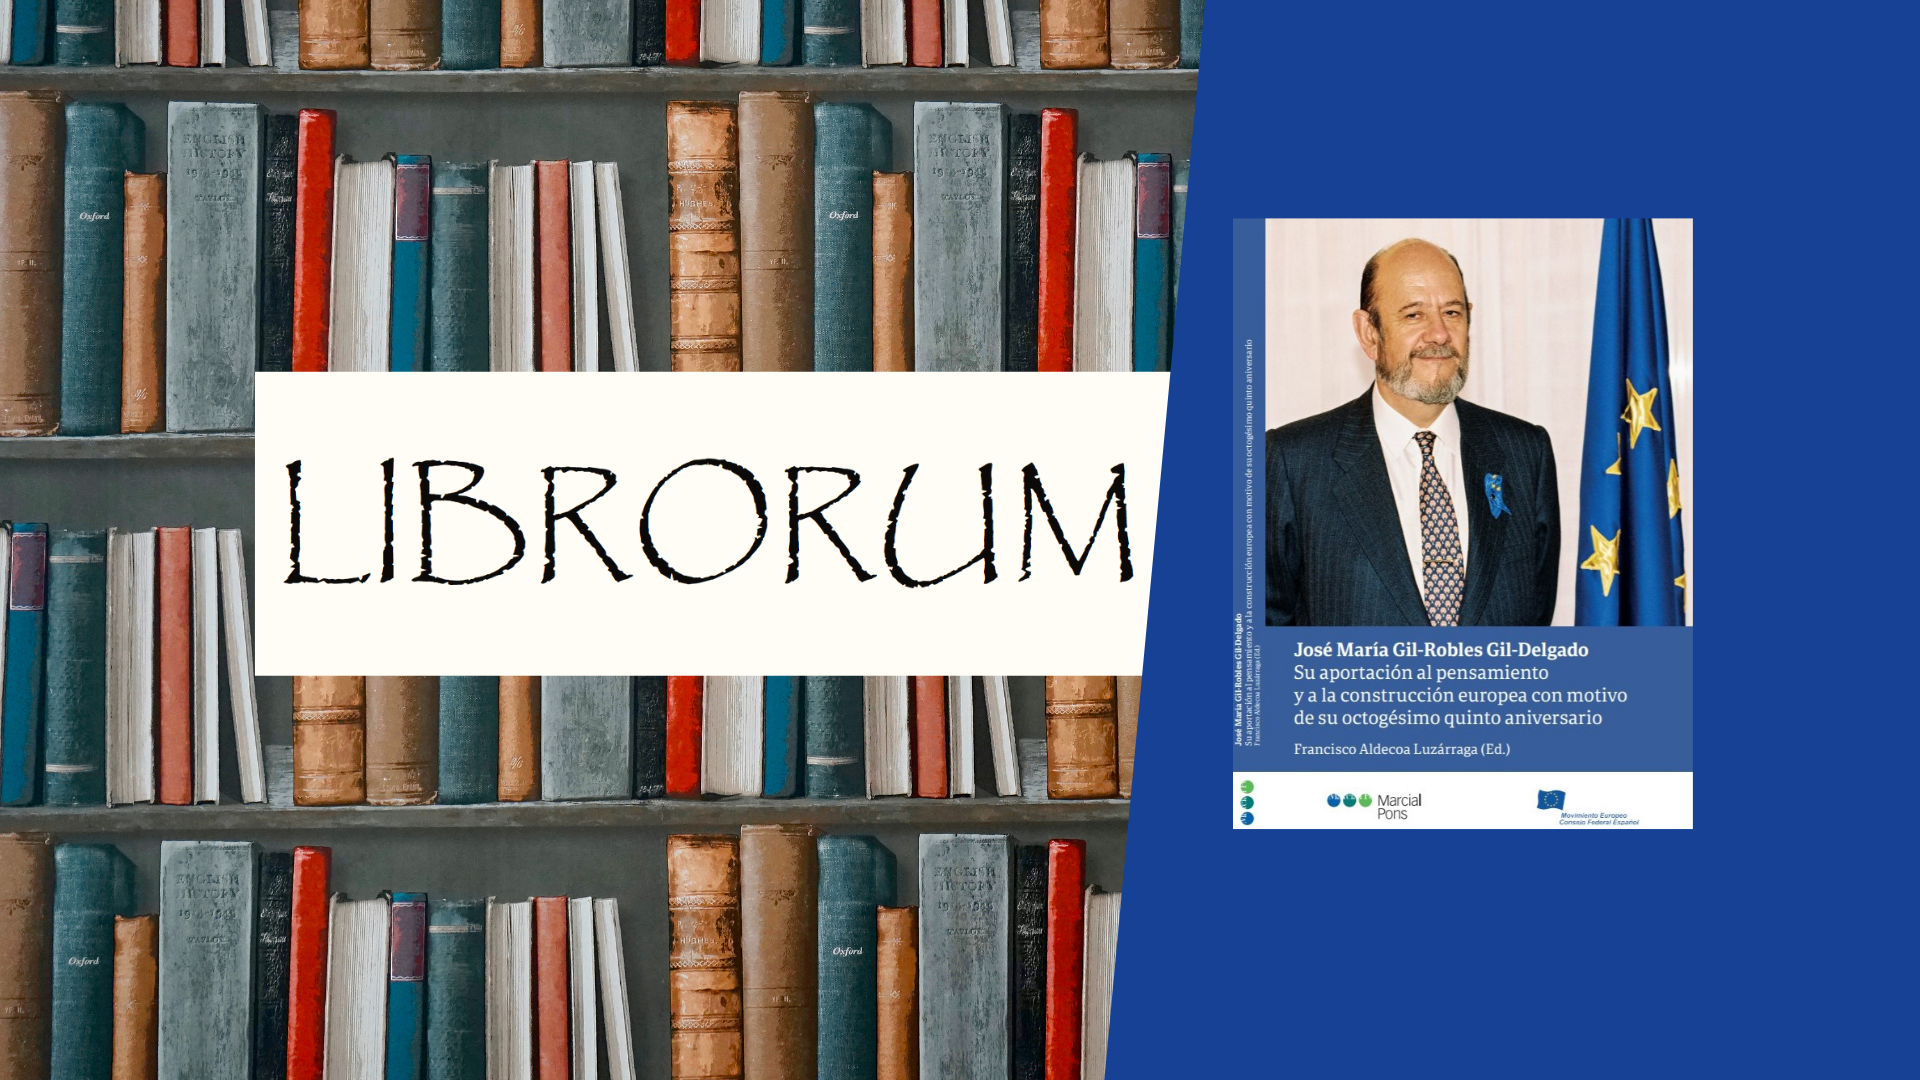 'Liber amicorum' par José María Gil-Robles